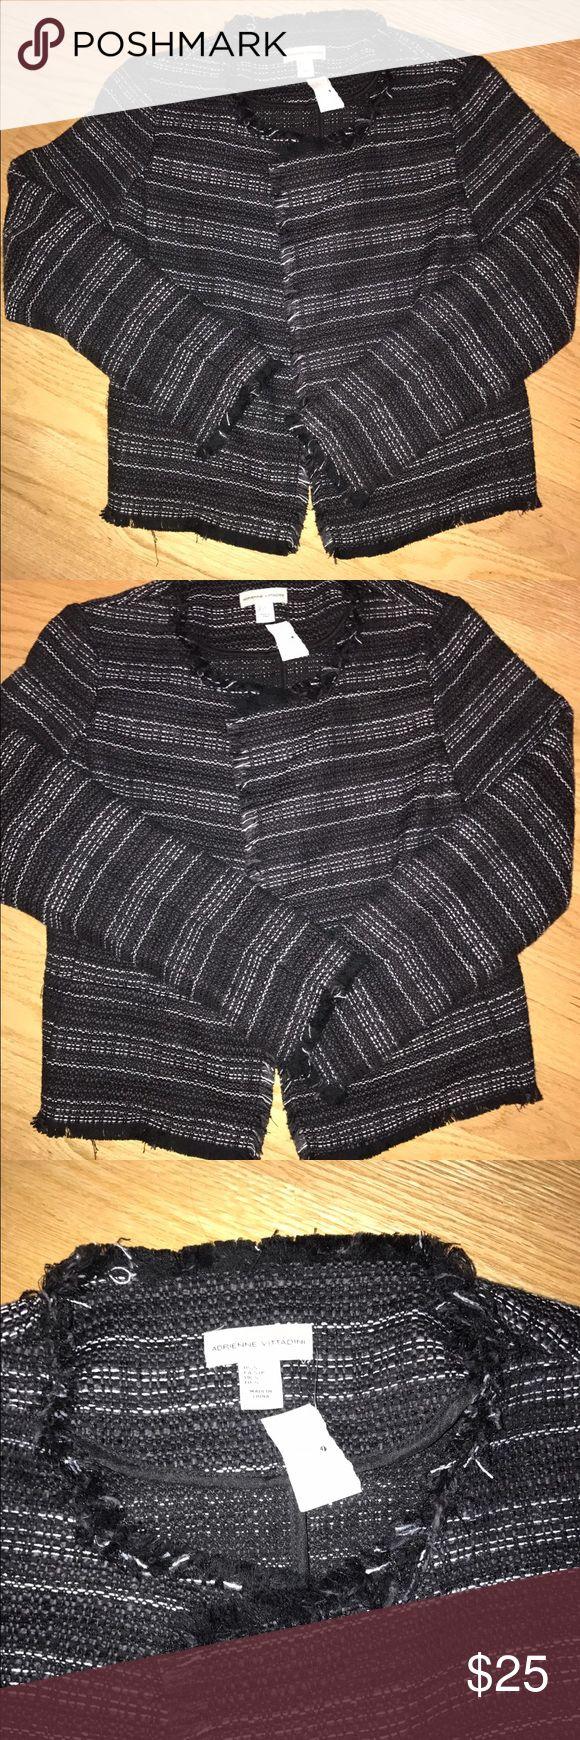 Adrienne vittadini blazer cardigan  small nwt Adrienne vittadini blazer cardigan jacket small nwt Adrienne Vittadini Jackets & Coats Blazers